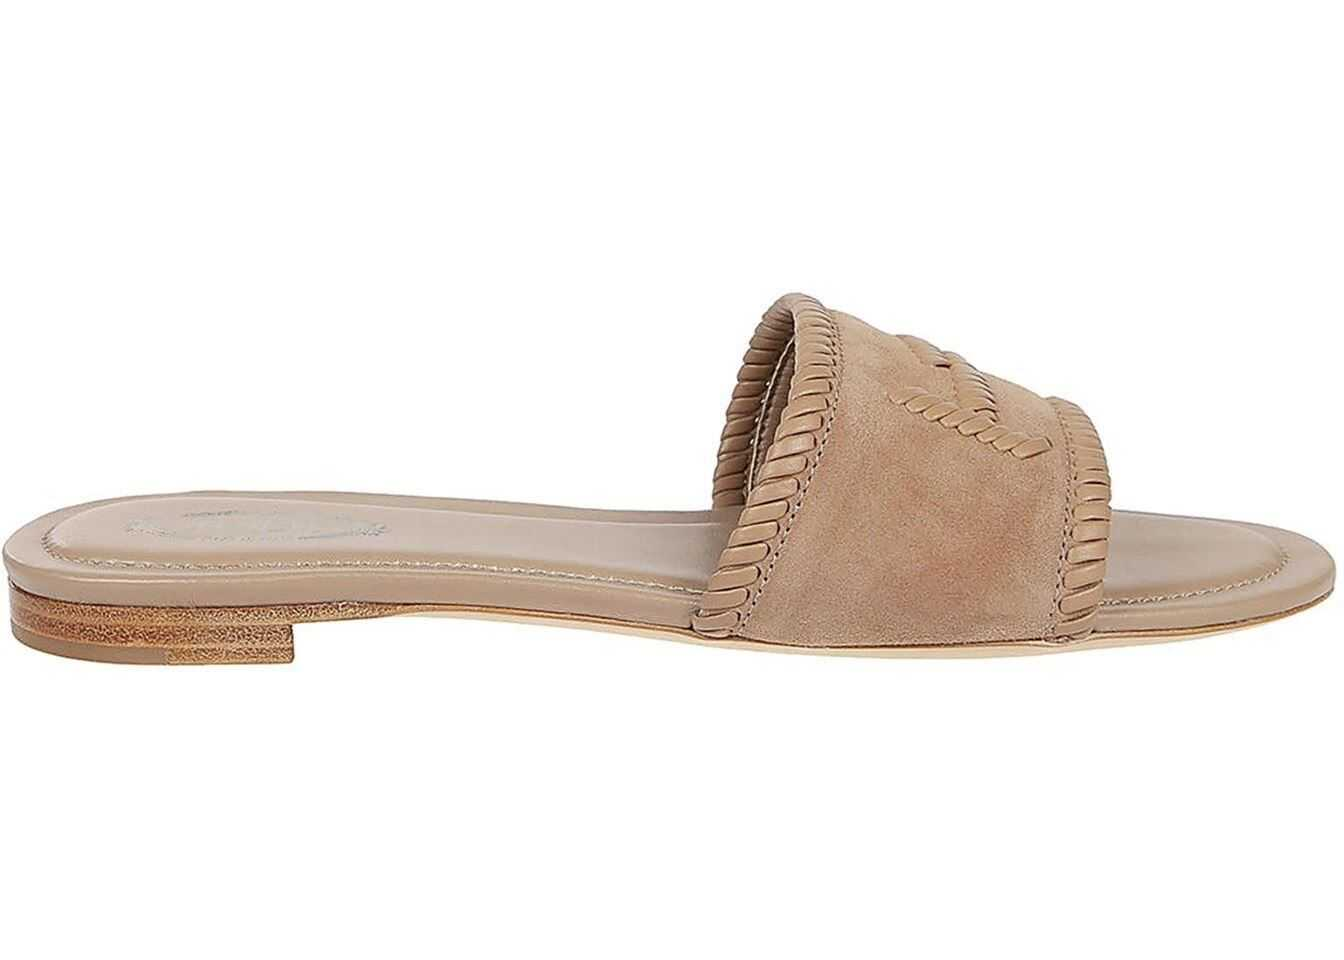 Woven Double T Flat Sandals